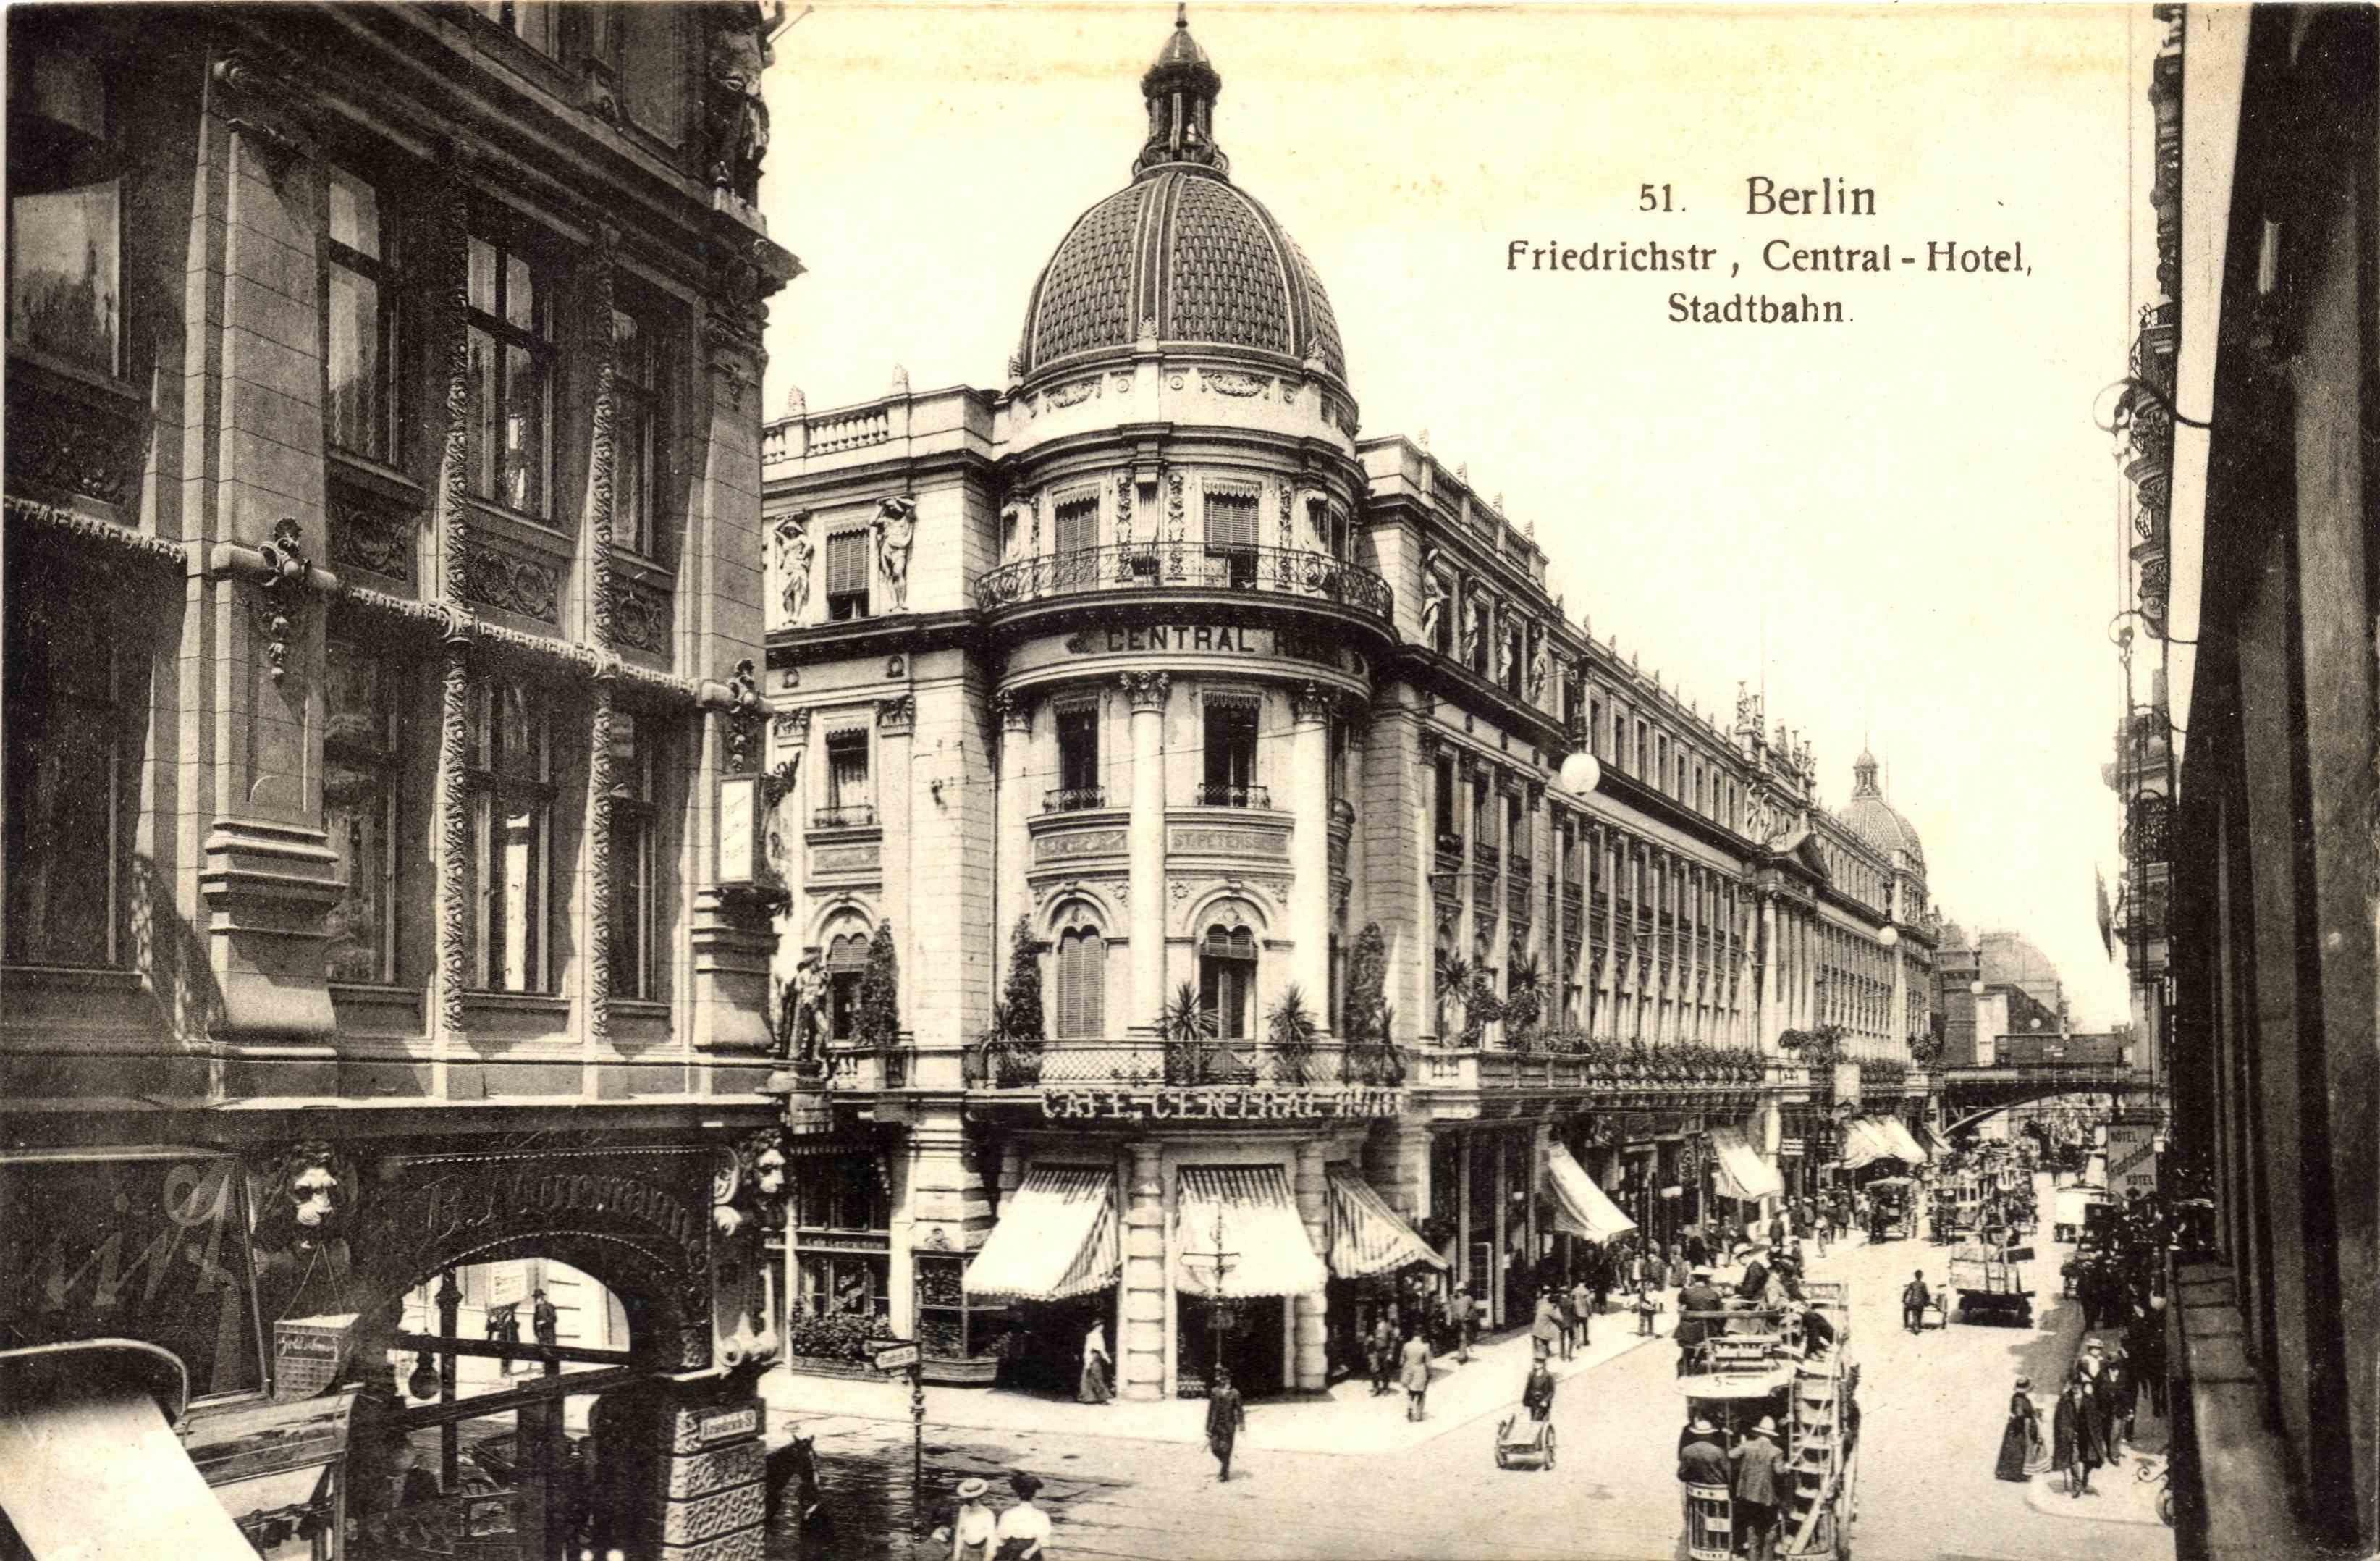 Adel S Hotel Berlin